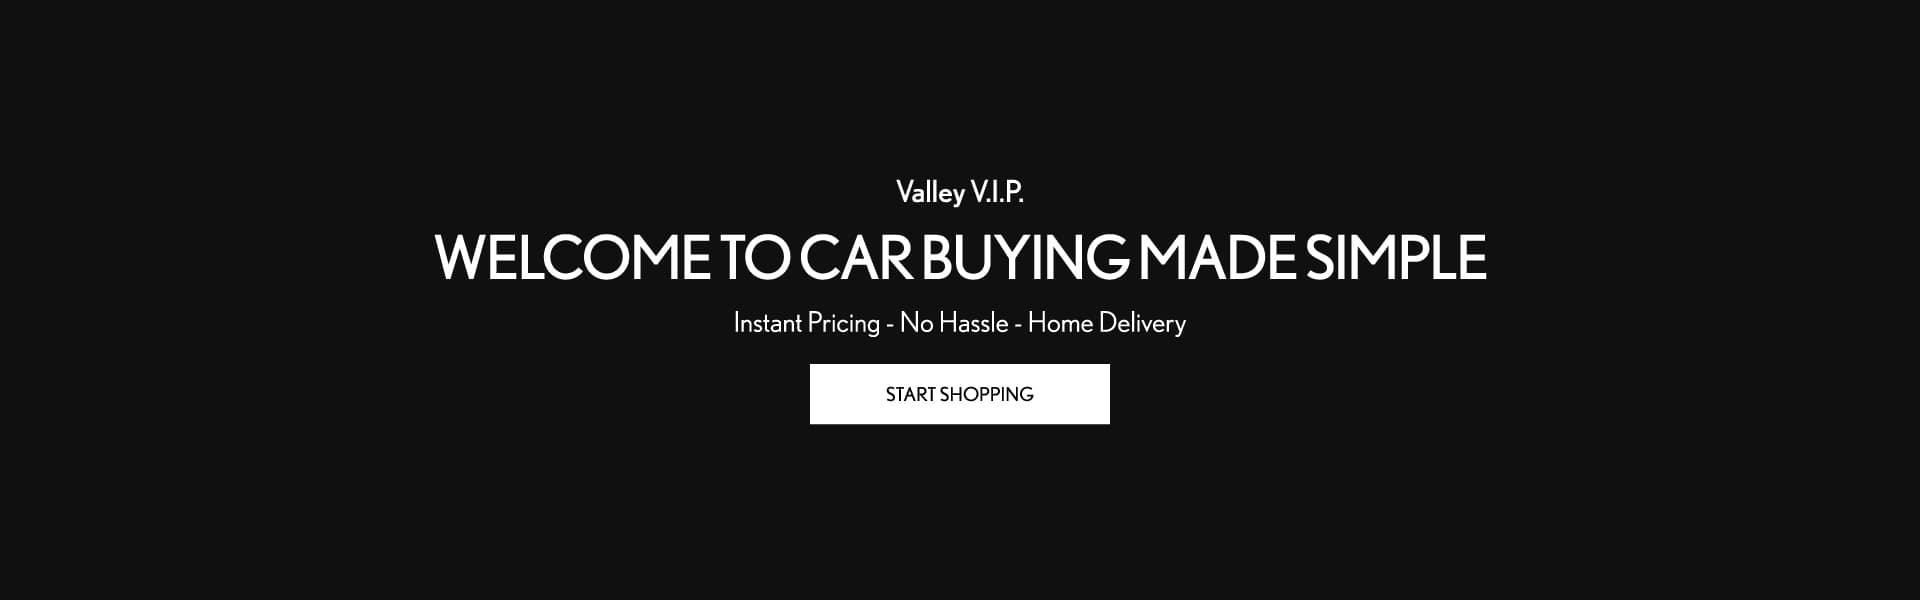 Valley VIP